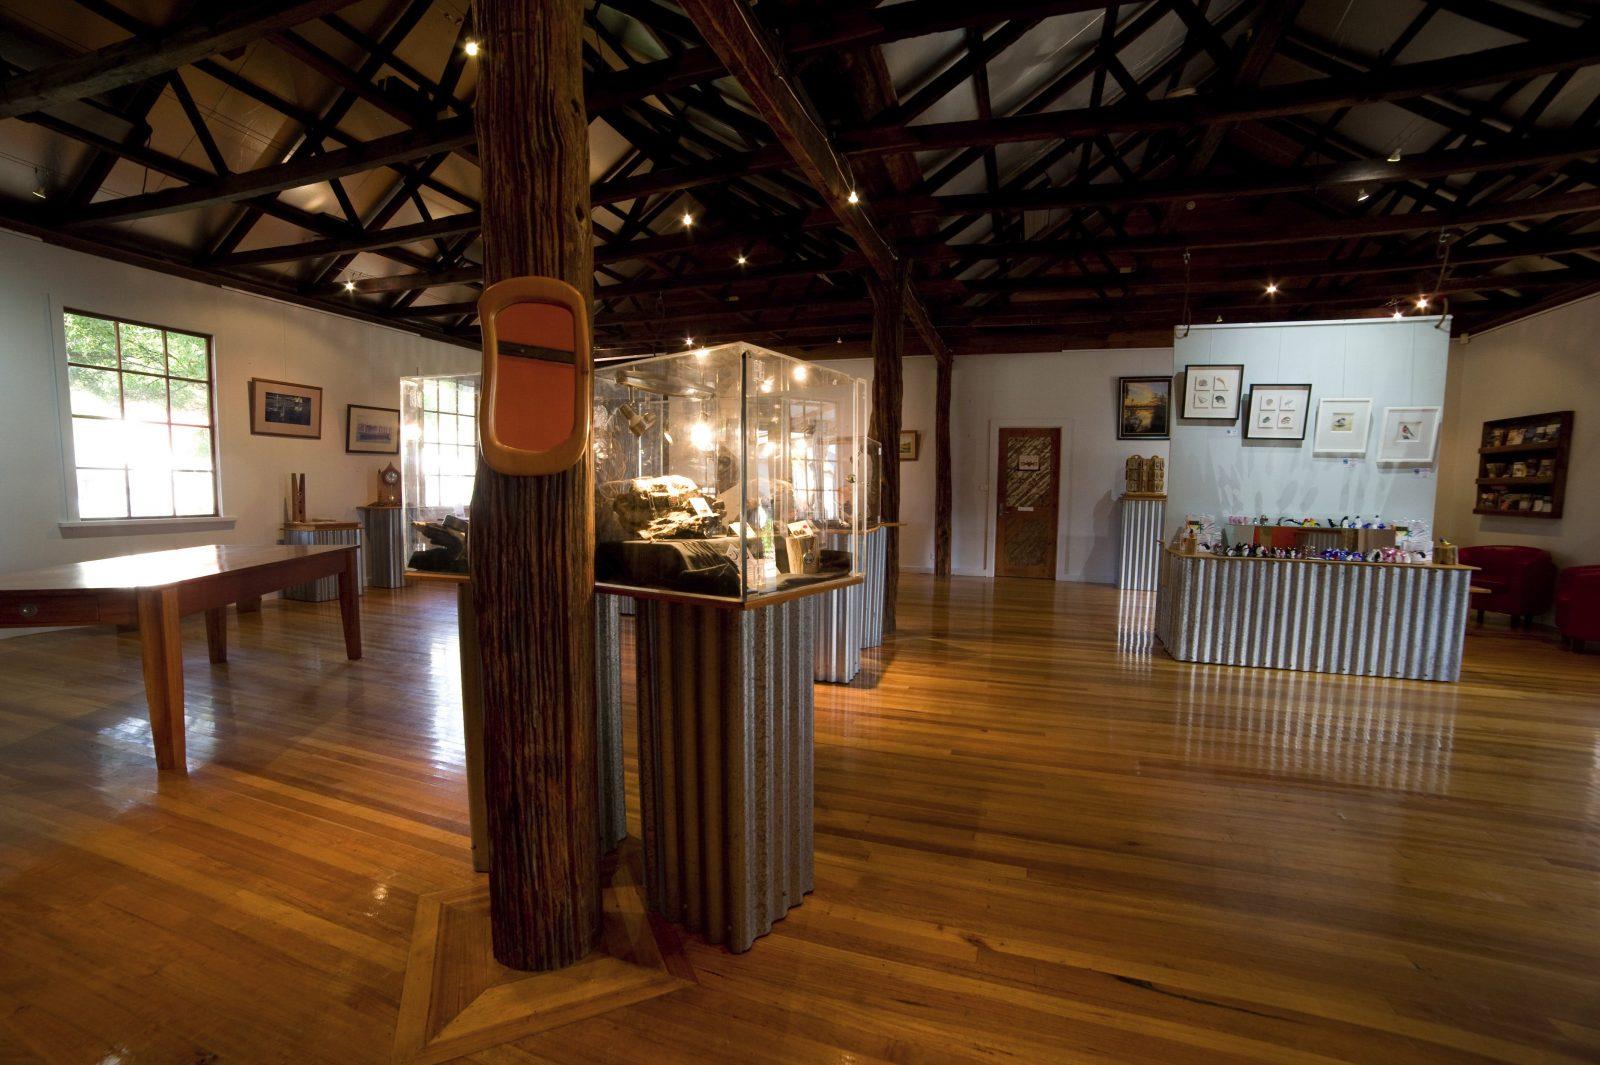 Cove Gallery